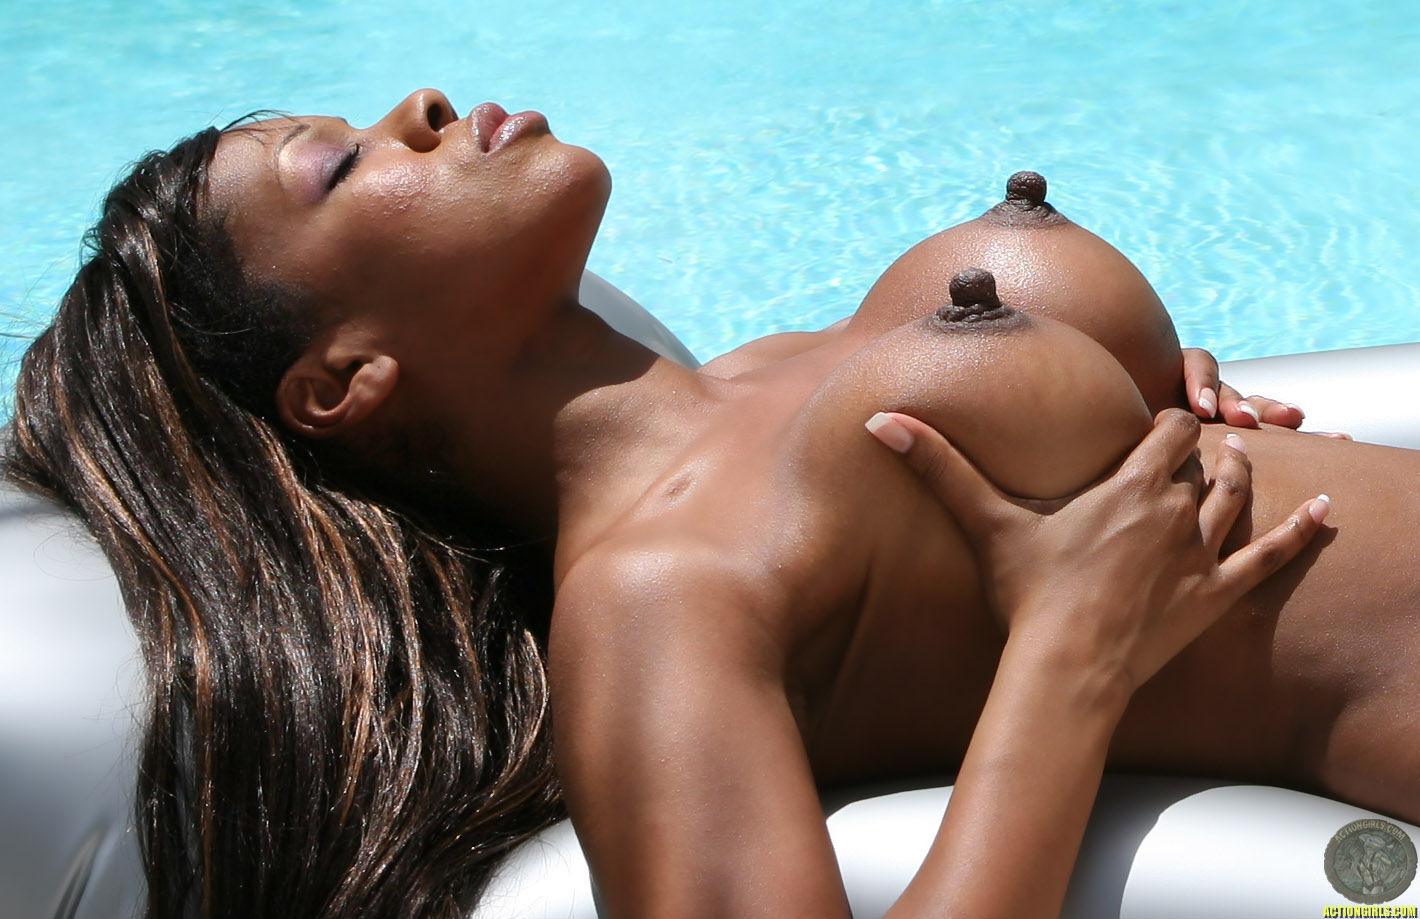 Фото порно звезд афро 15 фотография